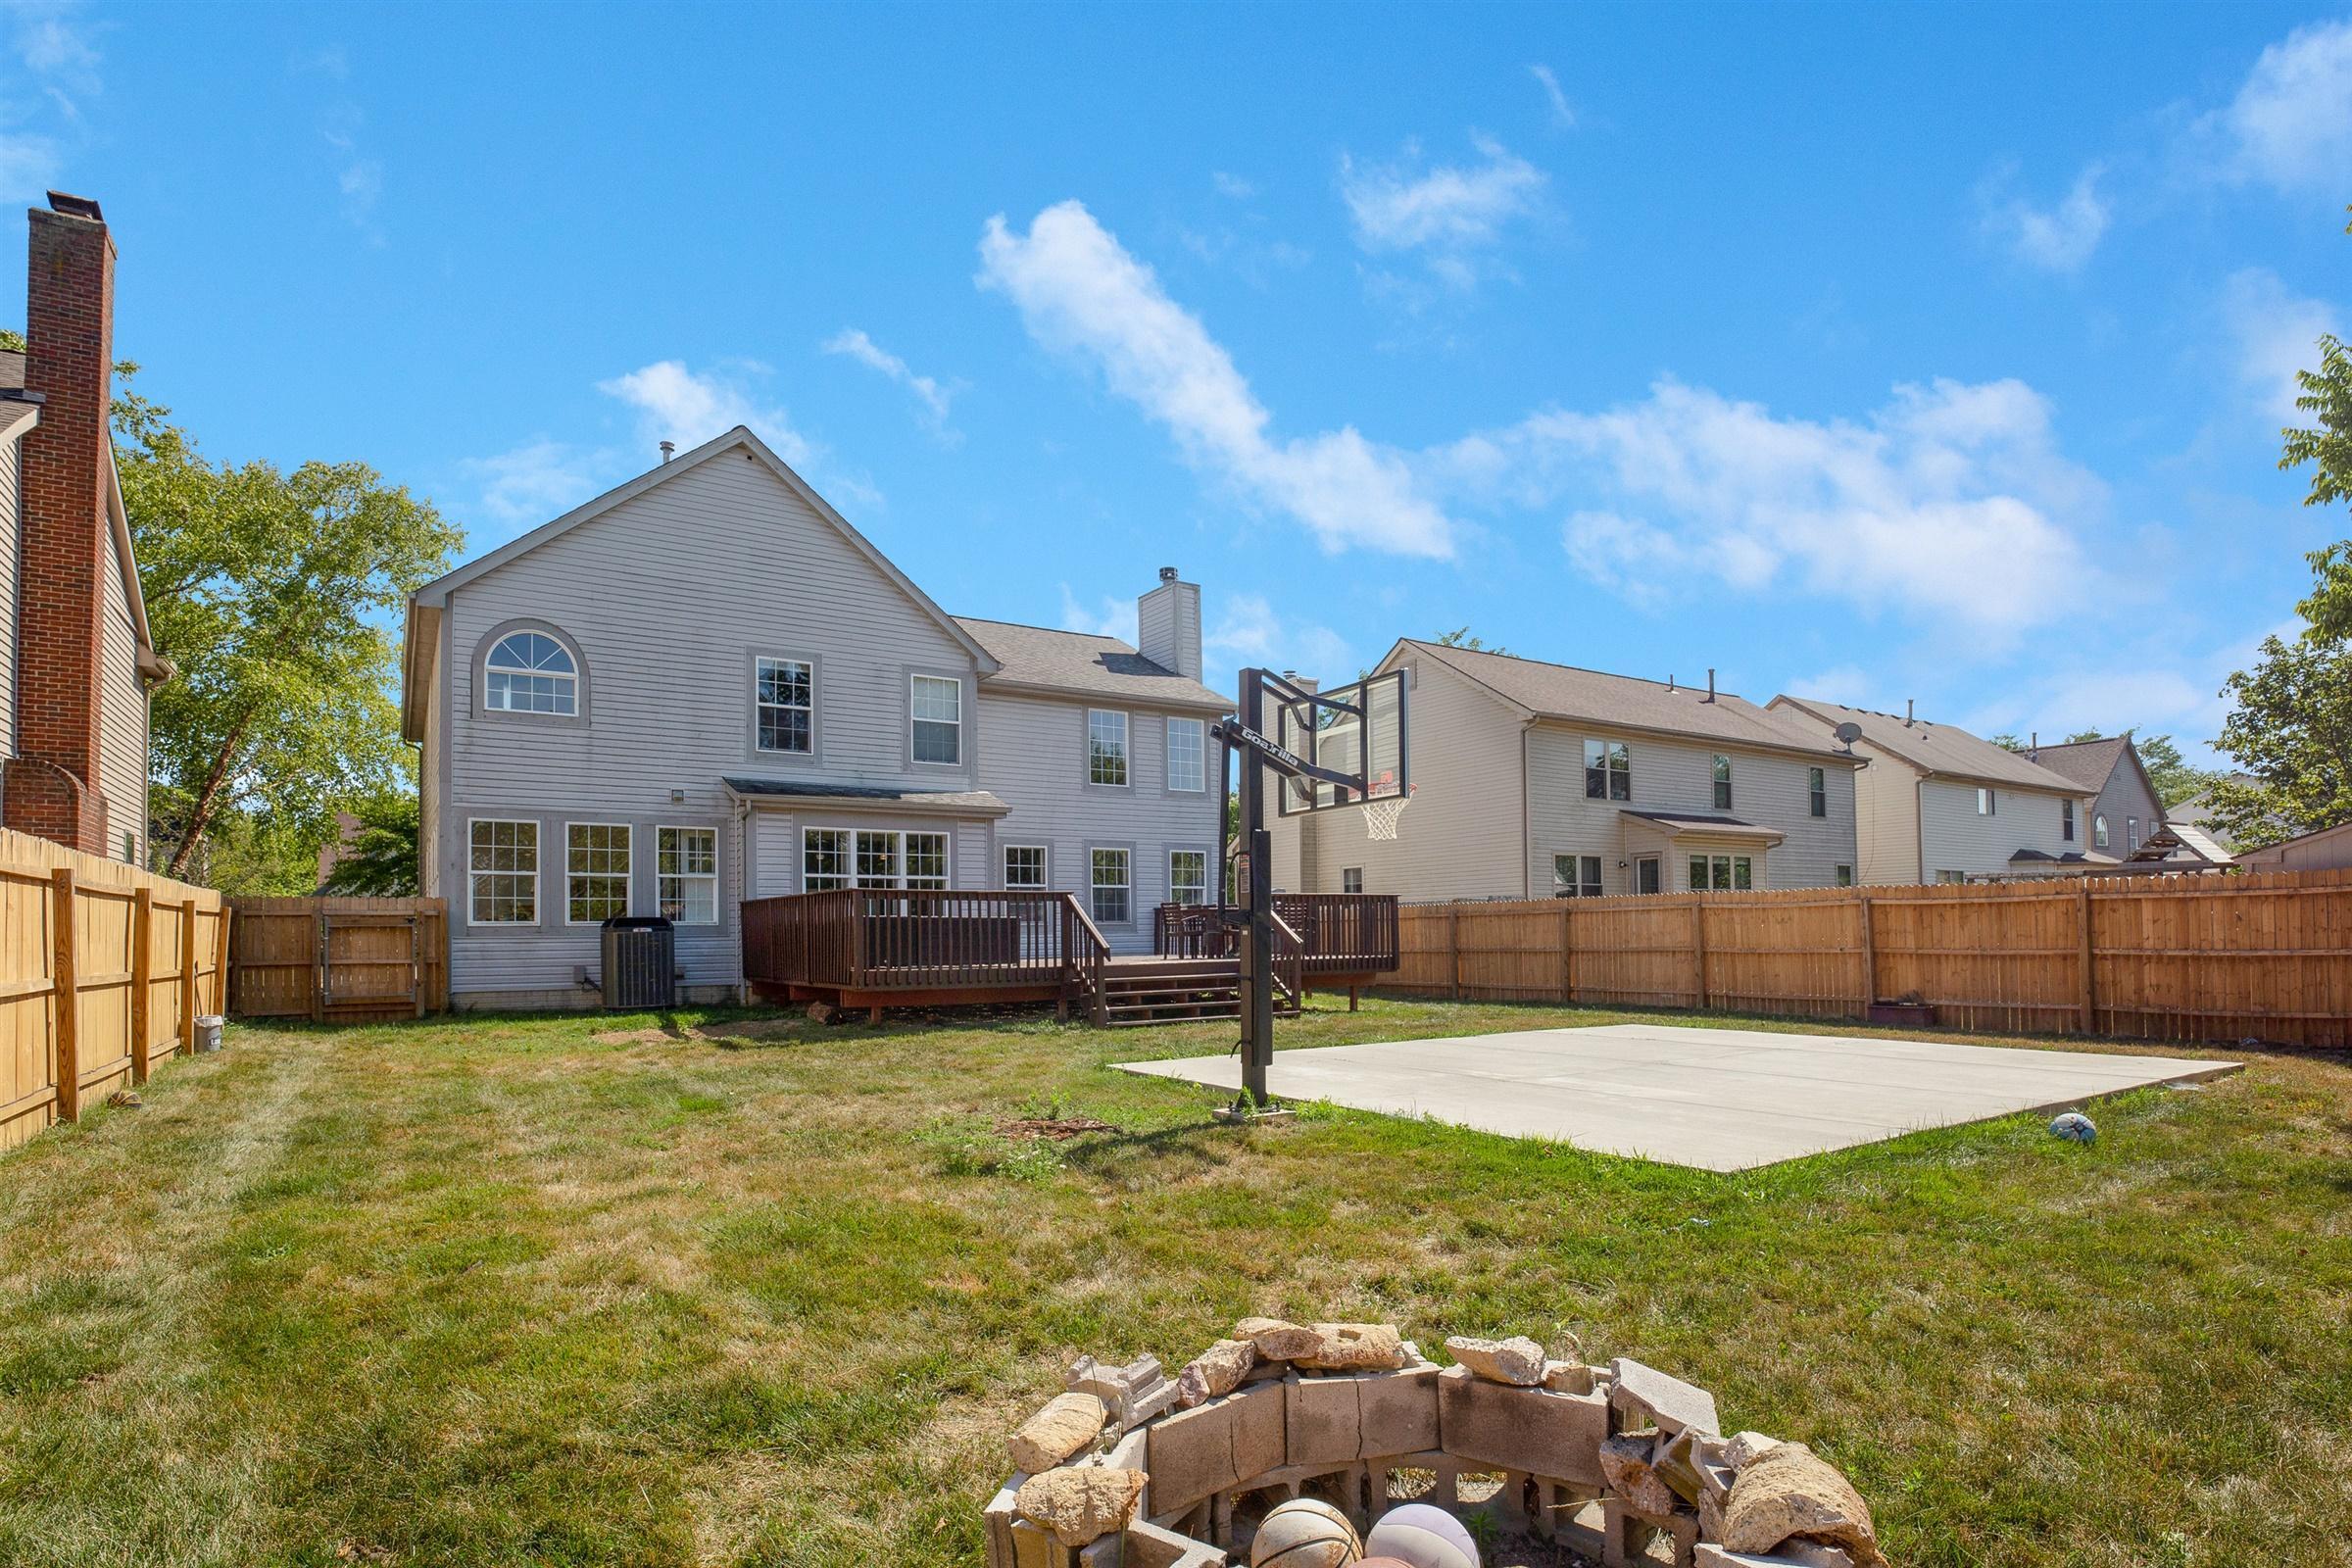 5636 Newington Drive, Hilliard, Ohio 43026, 4 Bedrooms Bedrooms, ,3 BathroomsBathrooms,Residential,For Sale,Newington,220025441